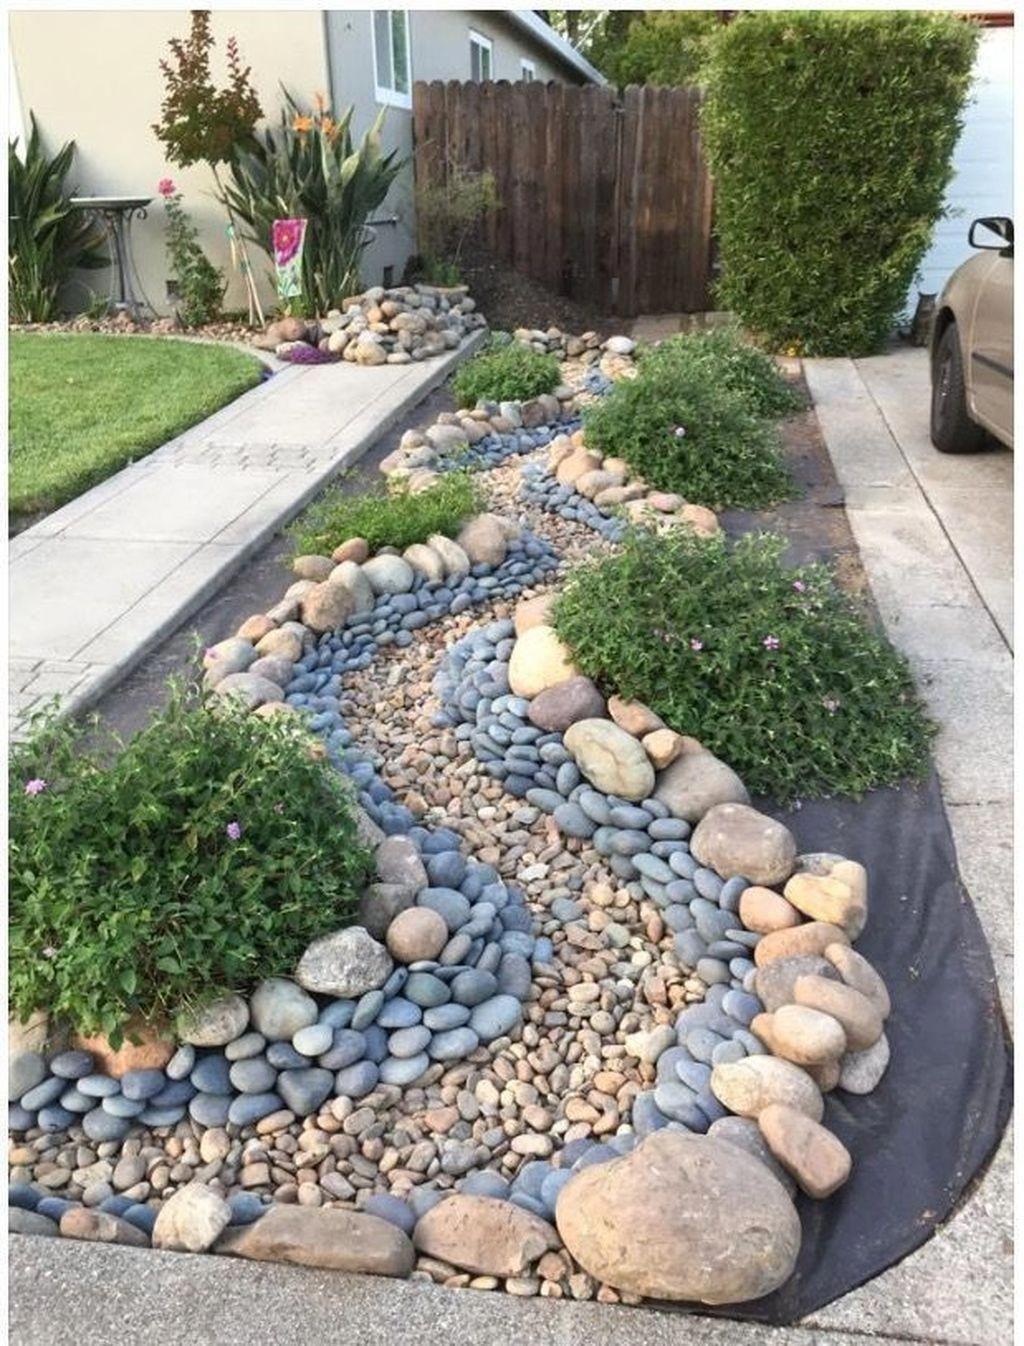 Cool And Unique Diy Rock Garden Ideas Bakcyardlandscaping Rockgardenideas Gardendesign Rock Garden Landscaping Landscaping With Rocks Front Yard Landscaping